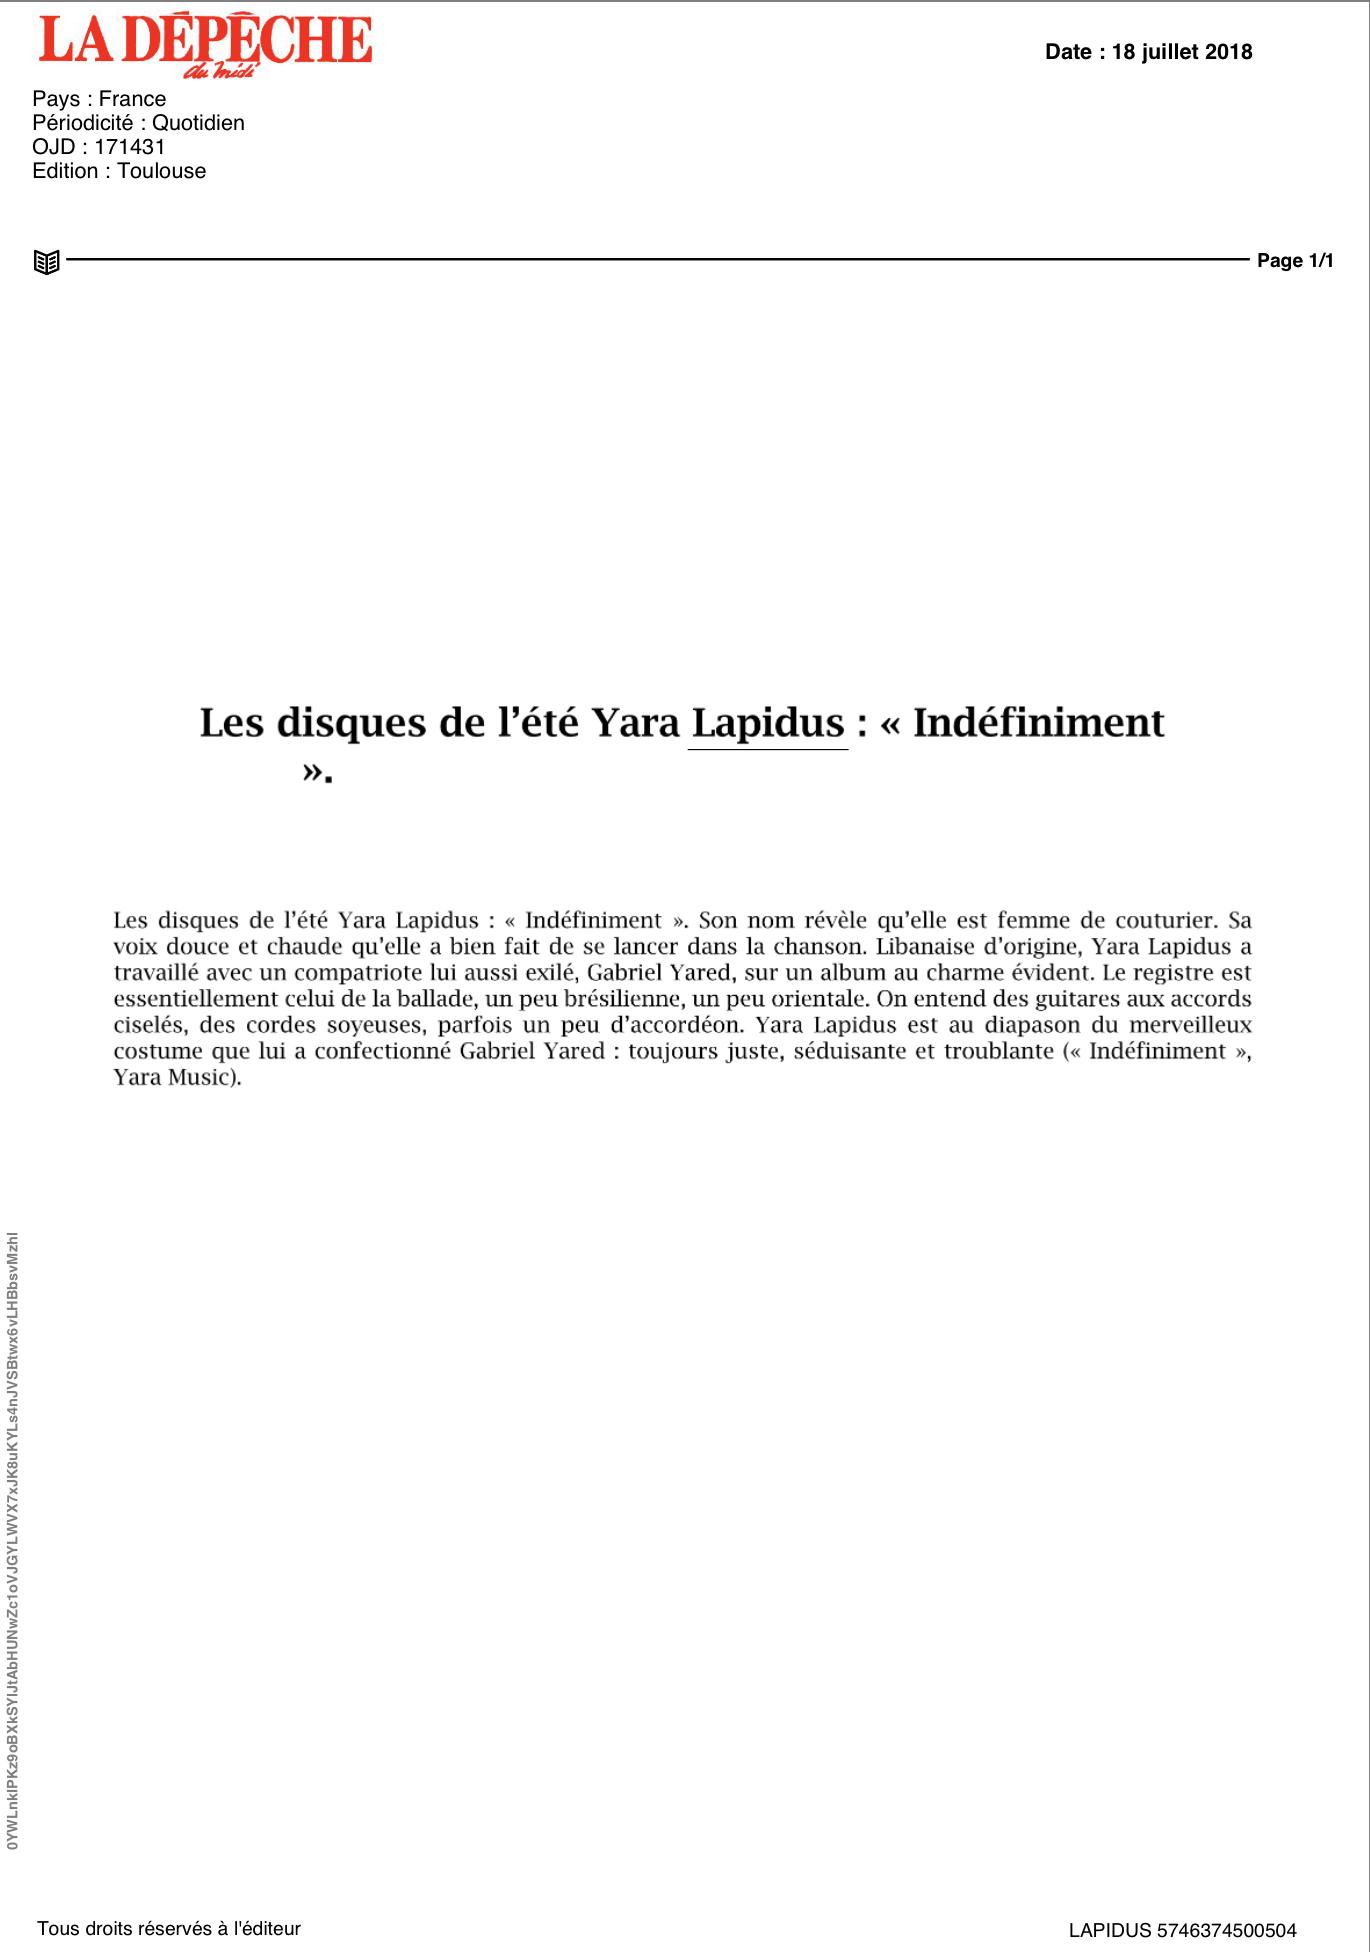 YL_La depeche du Midi.png